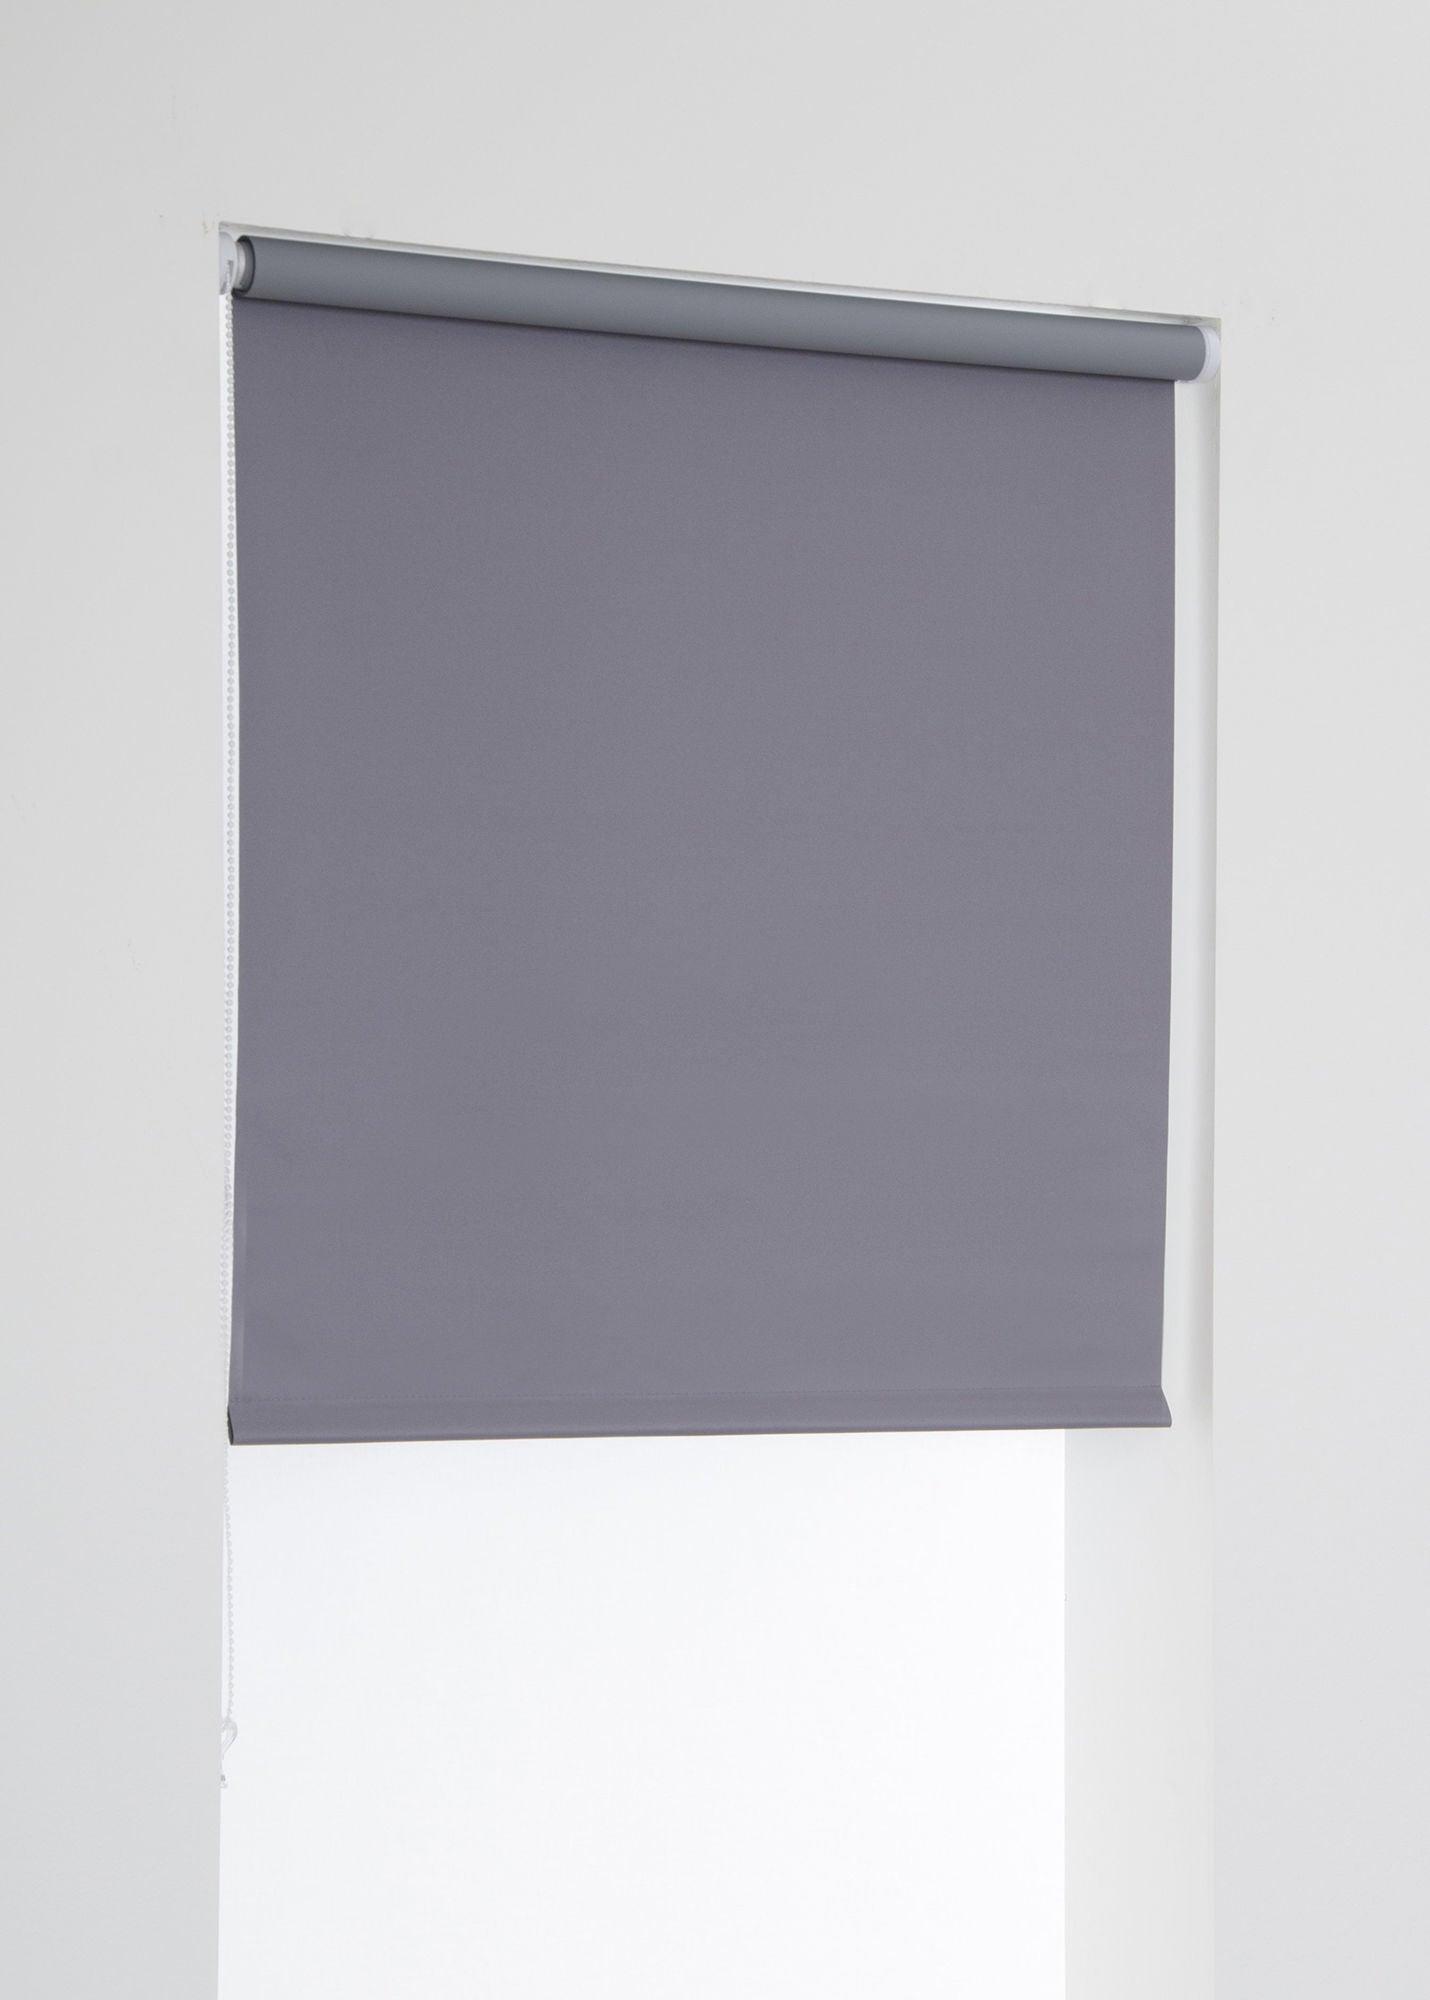 Hasta Blackout Rullgardin, Grey 100x185